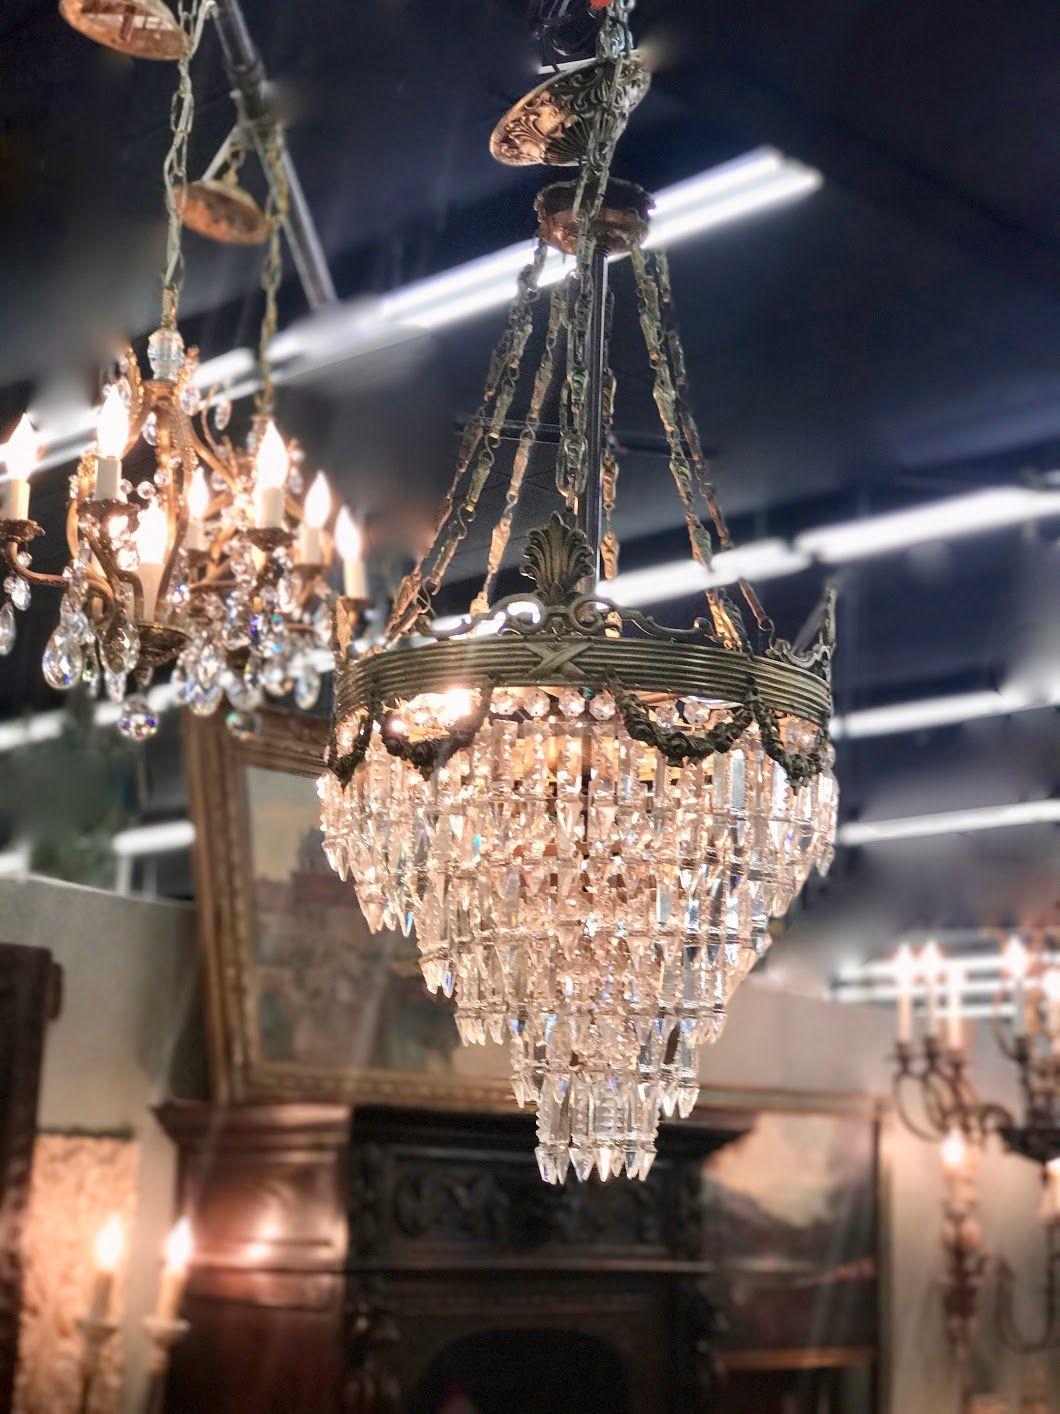 Bronze ornate chandelier 2650 grace designs at forestwood dealer bronze ornate chandelier 2650 grace designs at forestwood dealer 333 forestwood antique mall 5333 forest aloadofball Gallery